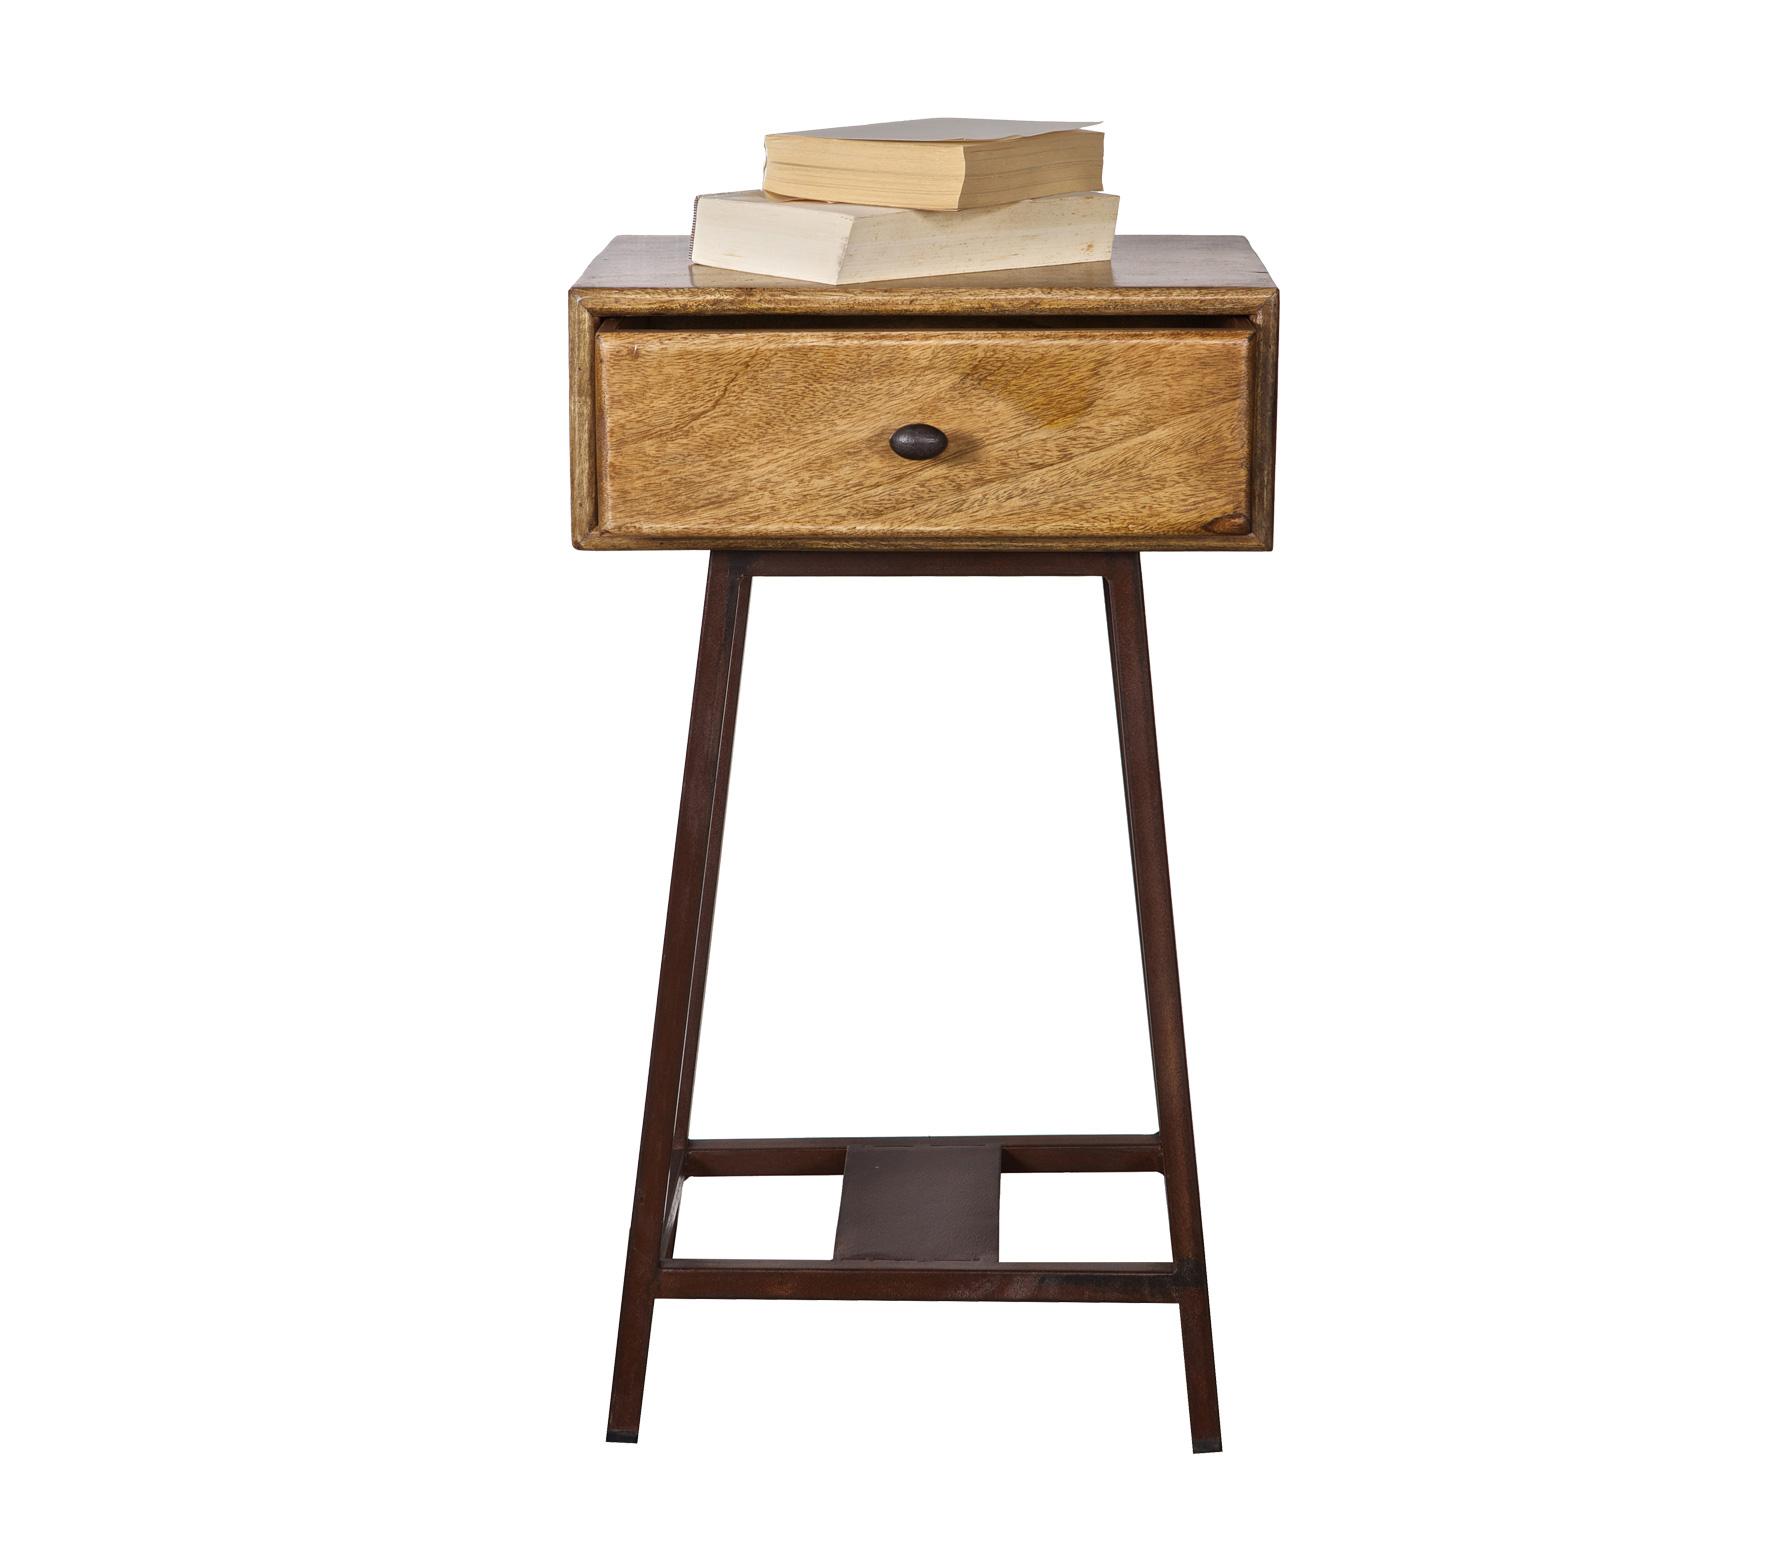 Hoog Tafeltje Met Lade.Bepurehome Skybox Vintage Sidetable Mangohout Bruin